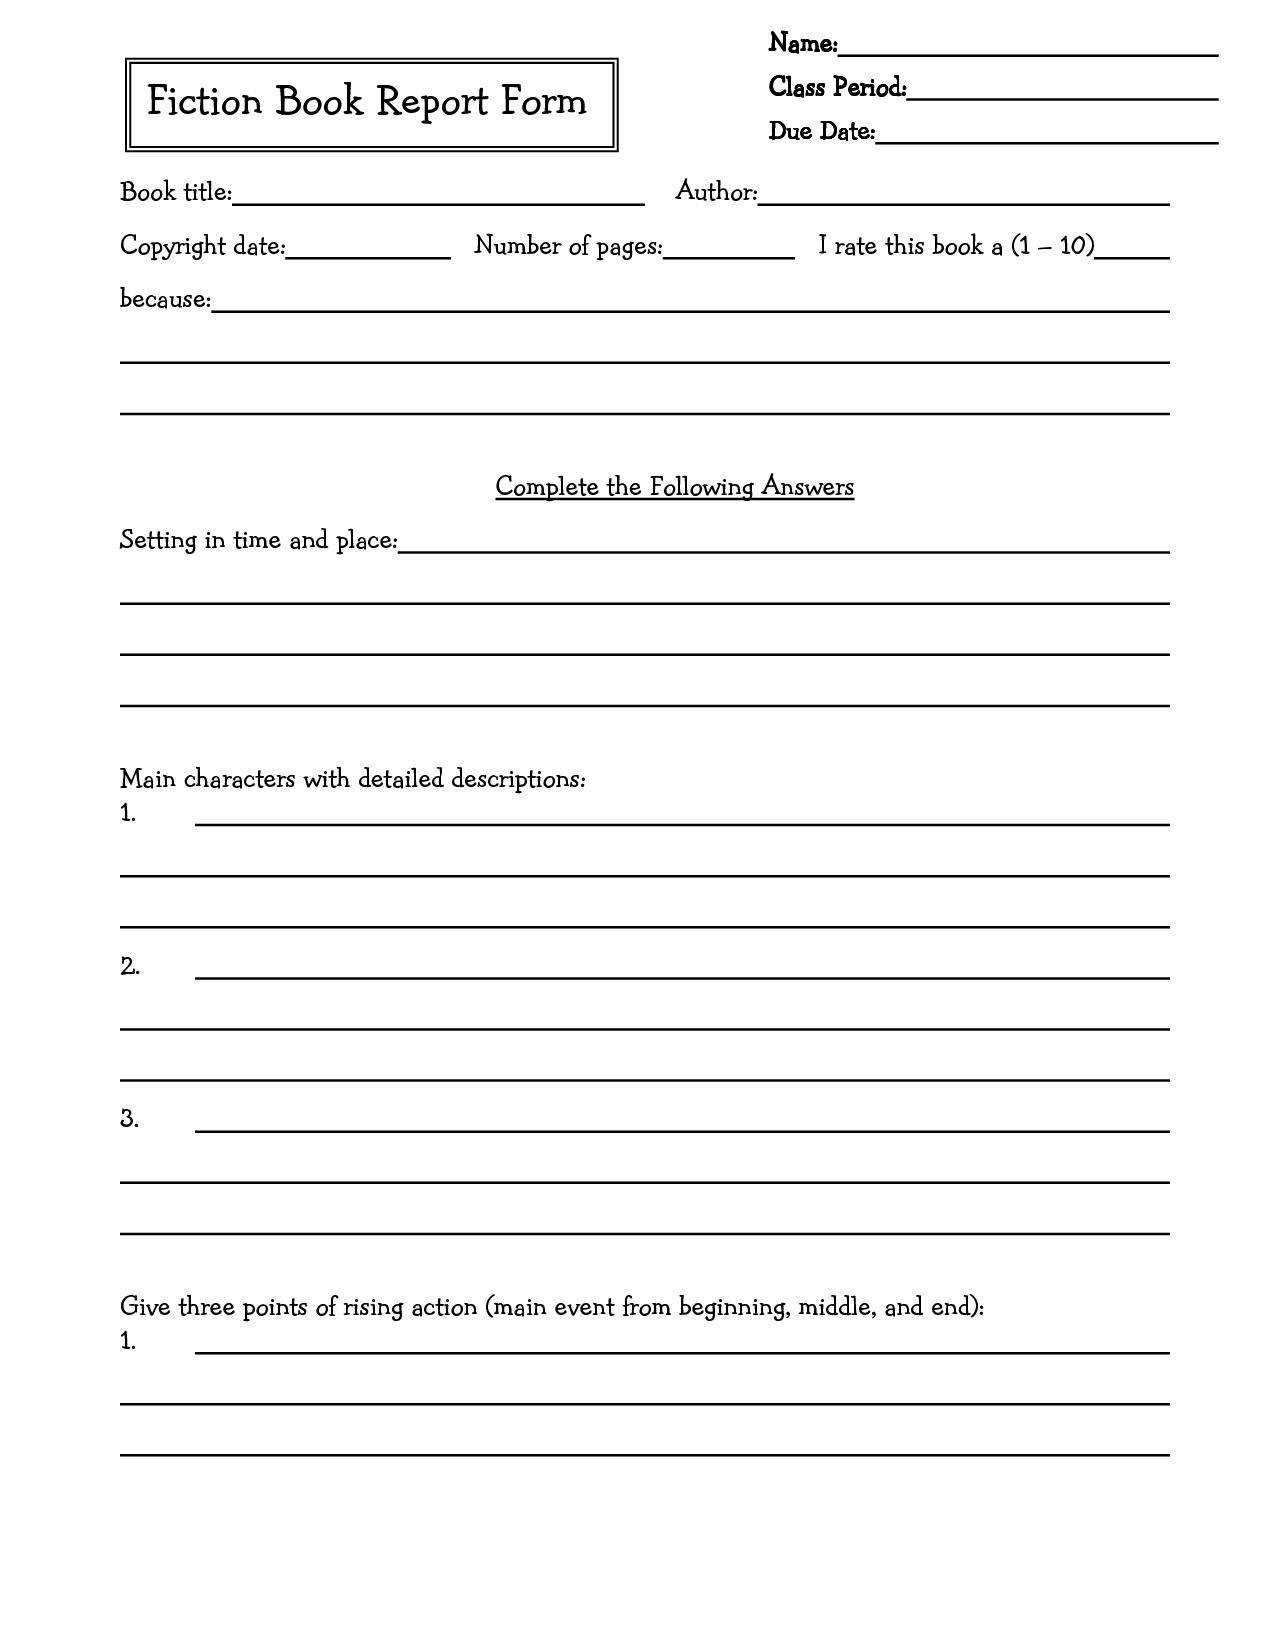 Middle School Book Report Brochure. 6Th Grade | 7Th Grade For Book Report Template Middle School